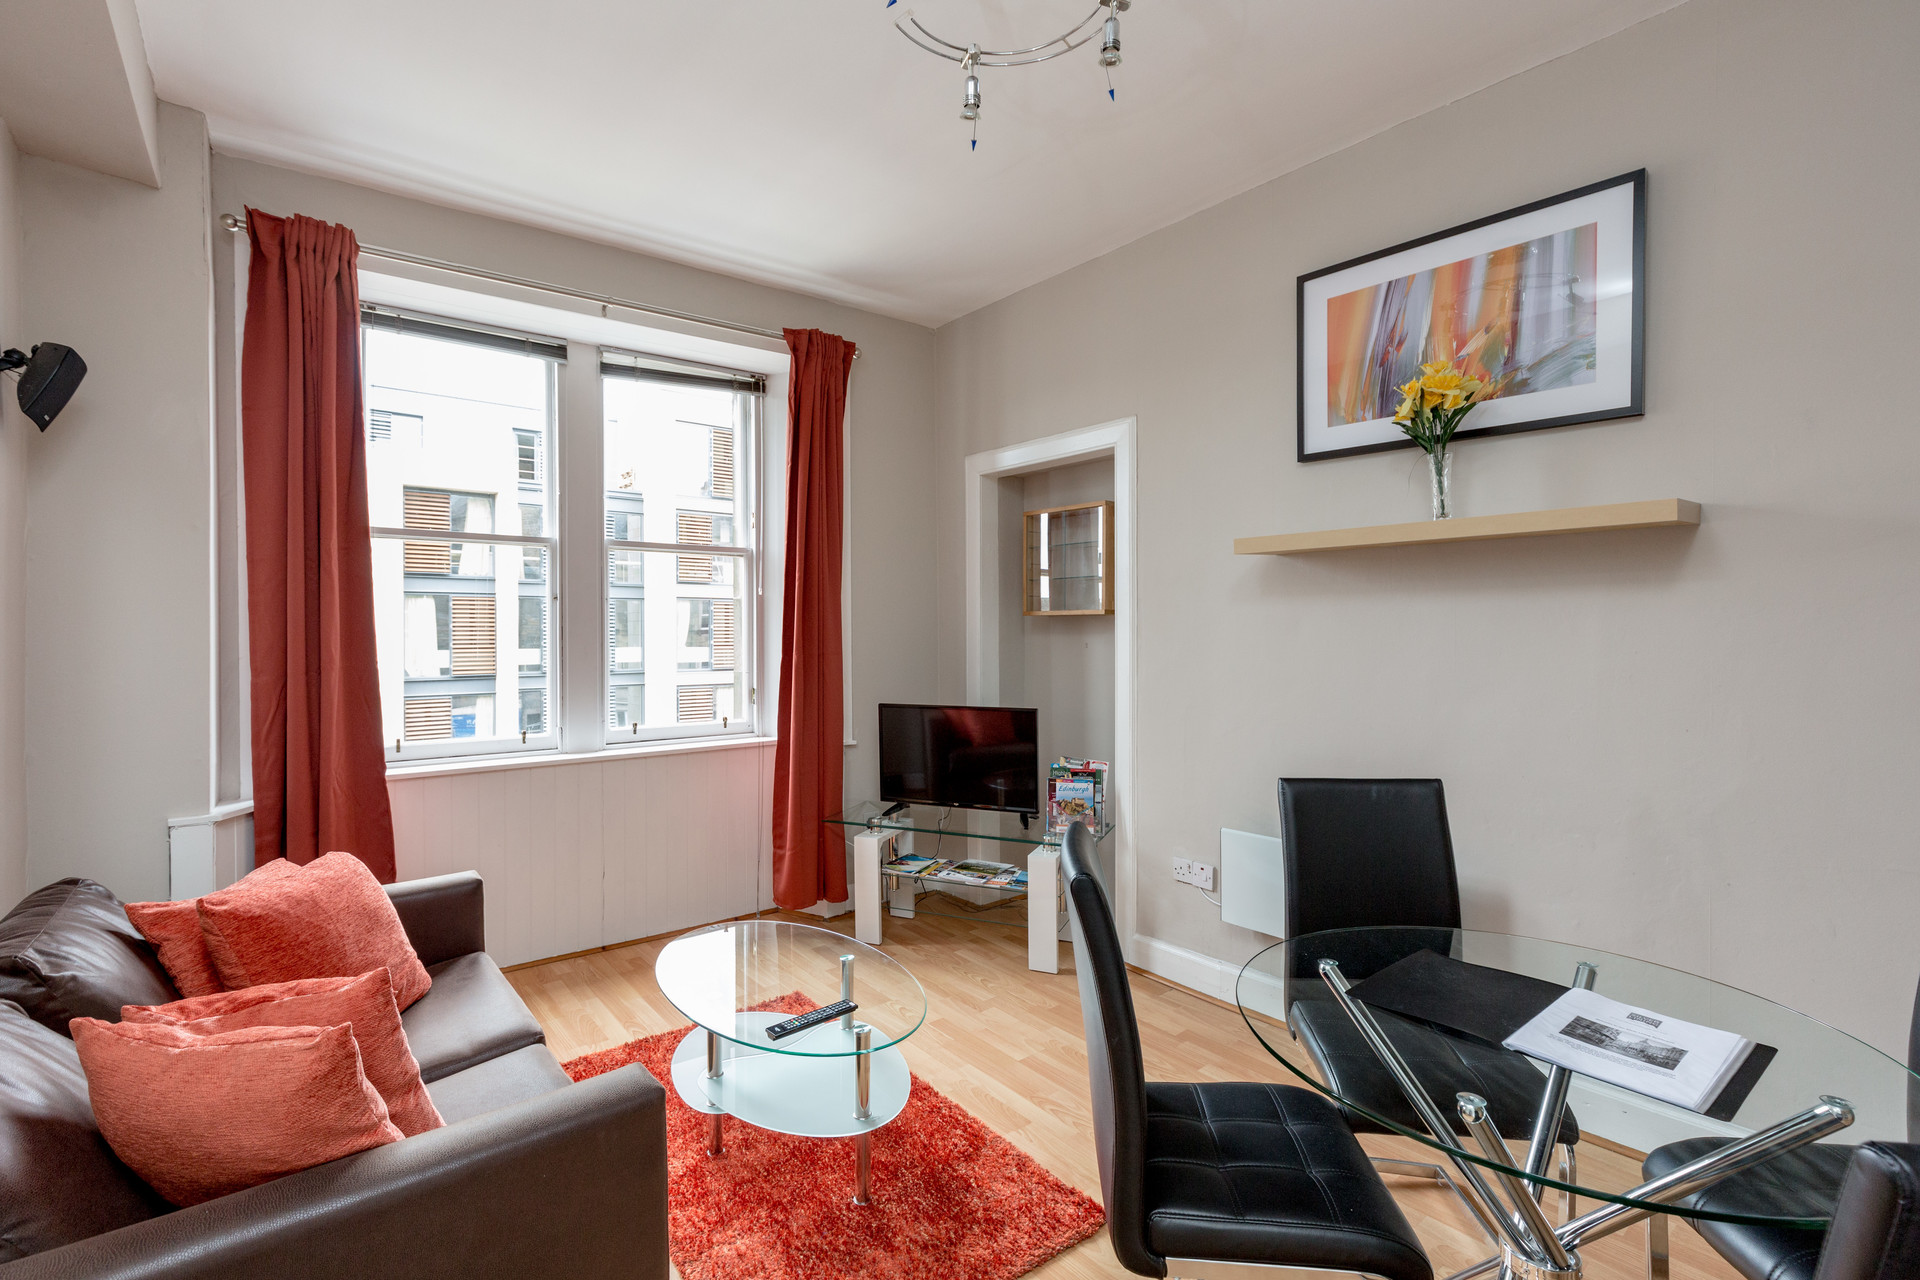 1 Bedroom Apartment Available In January On St Leonard S Street Newington Edinburgh 6